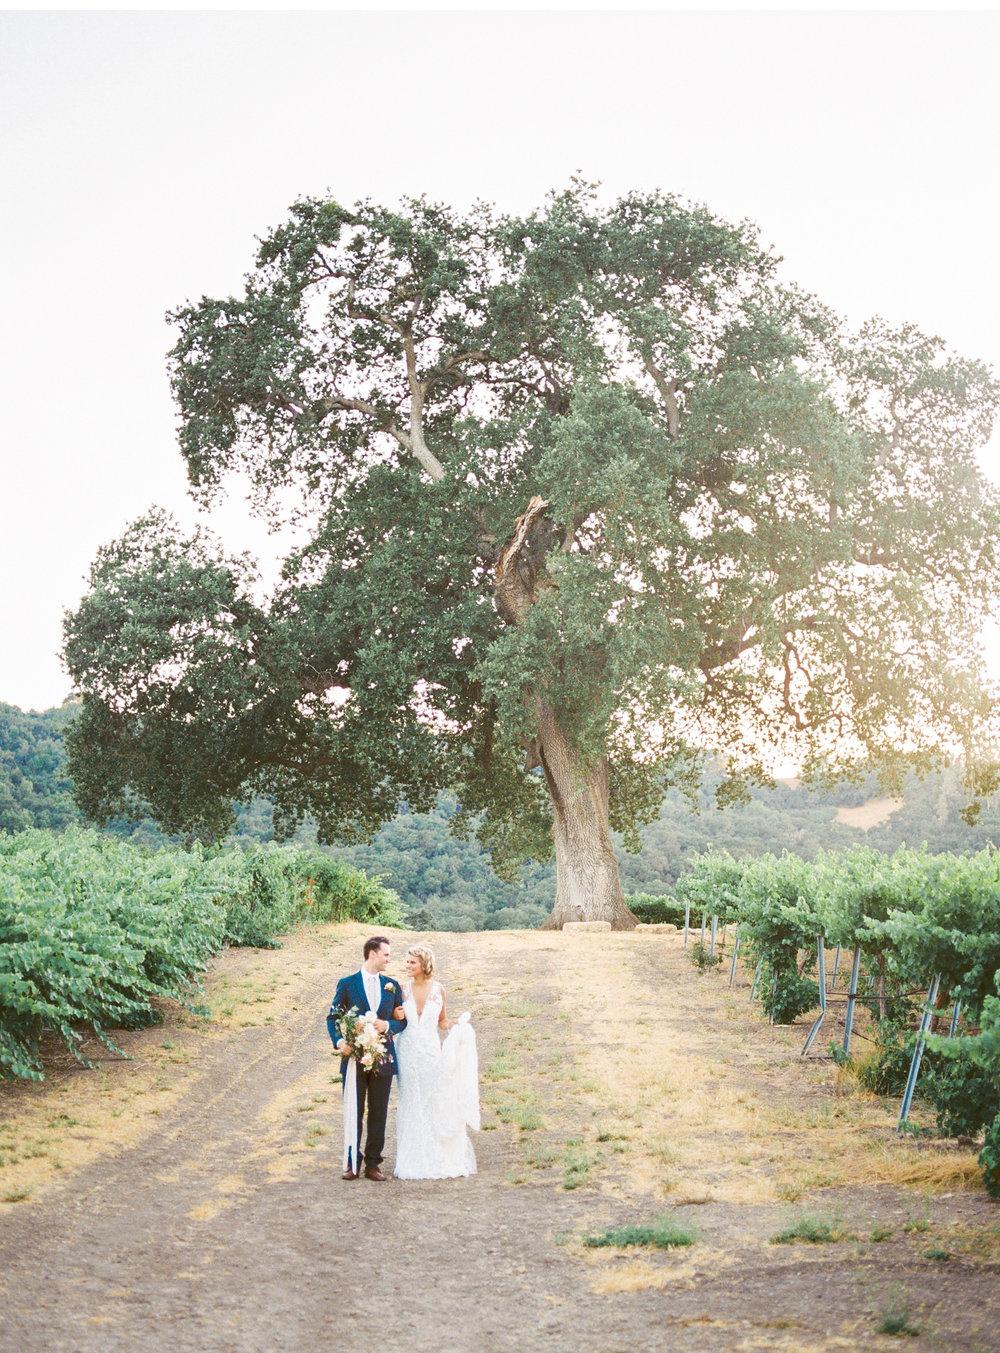 Malibu-Weddings-Natalie-Schutt-Photography_15.jpg